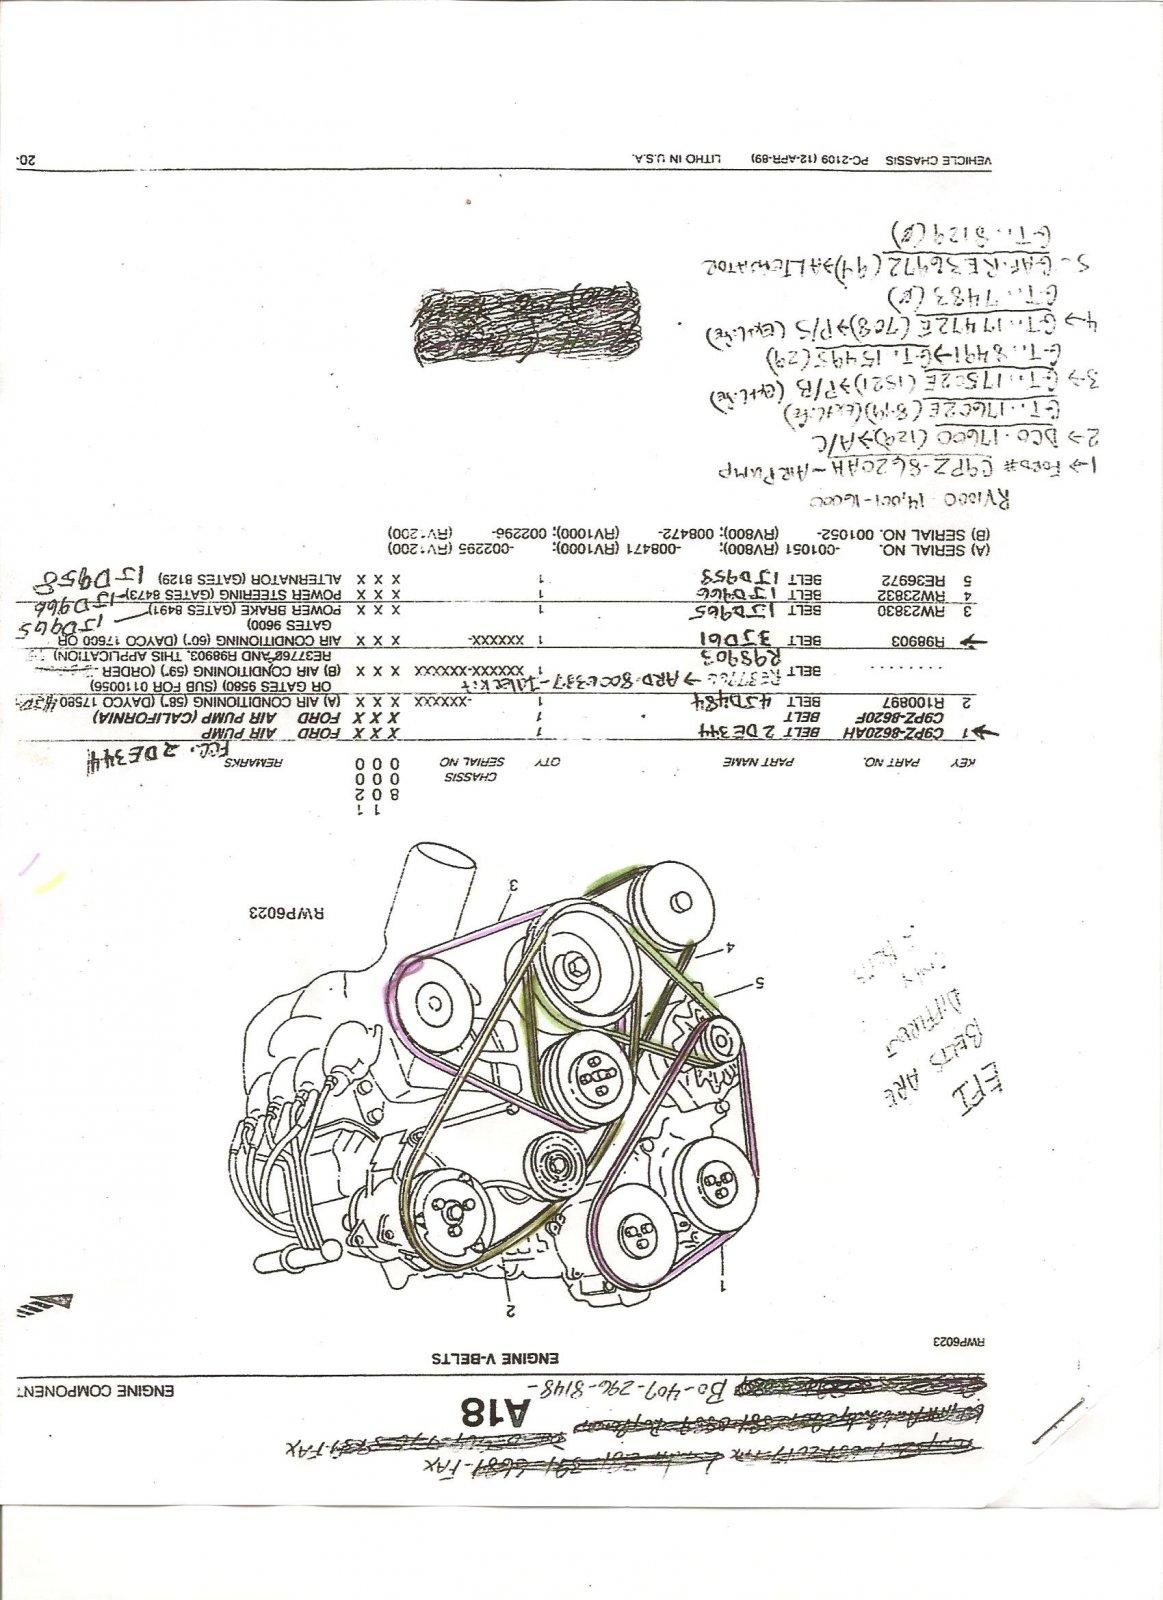 Click image for larger version  Name:RV Fan Belt Diagram 001.jpg Views:6282 Size:267.9 KB ID:22454